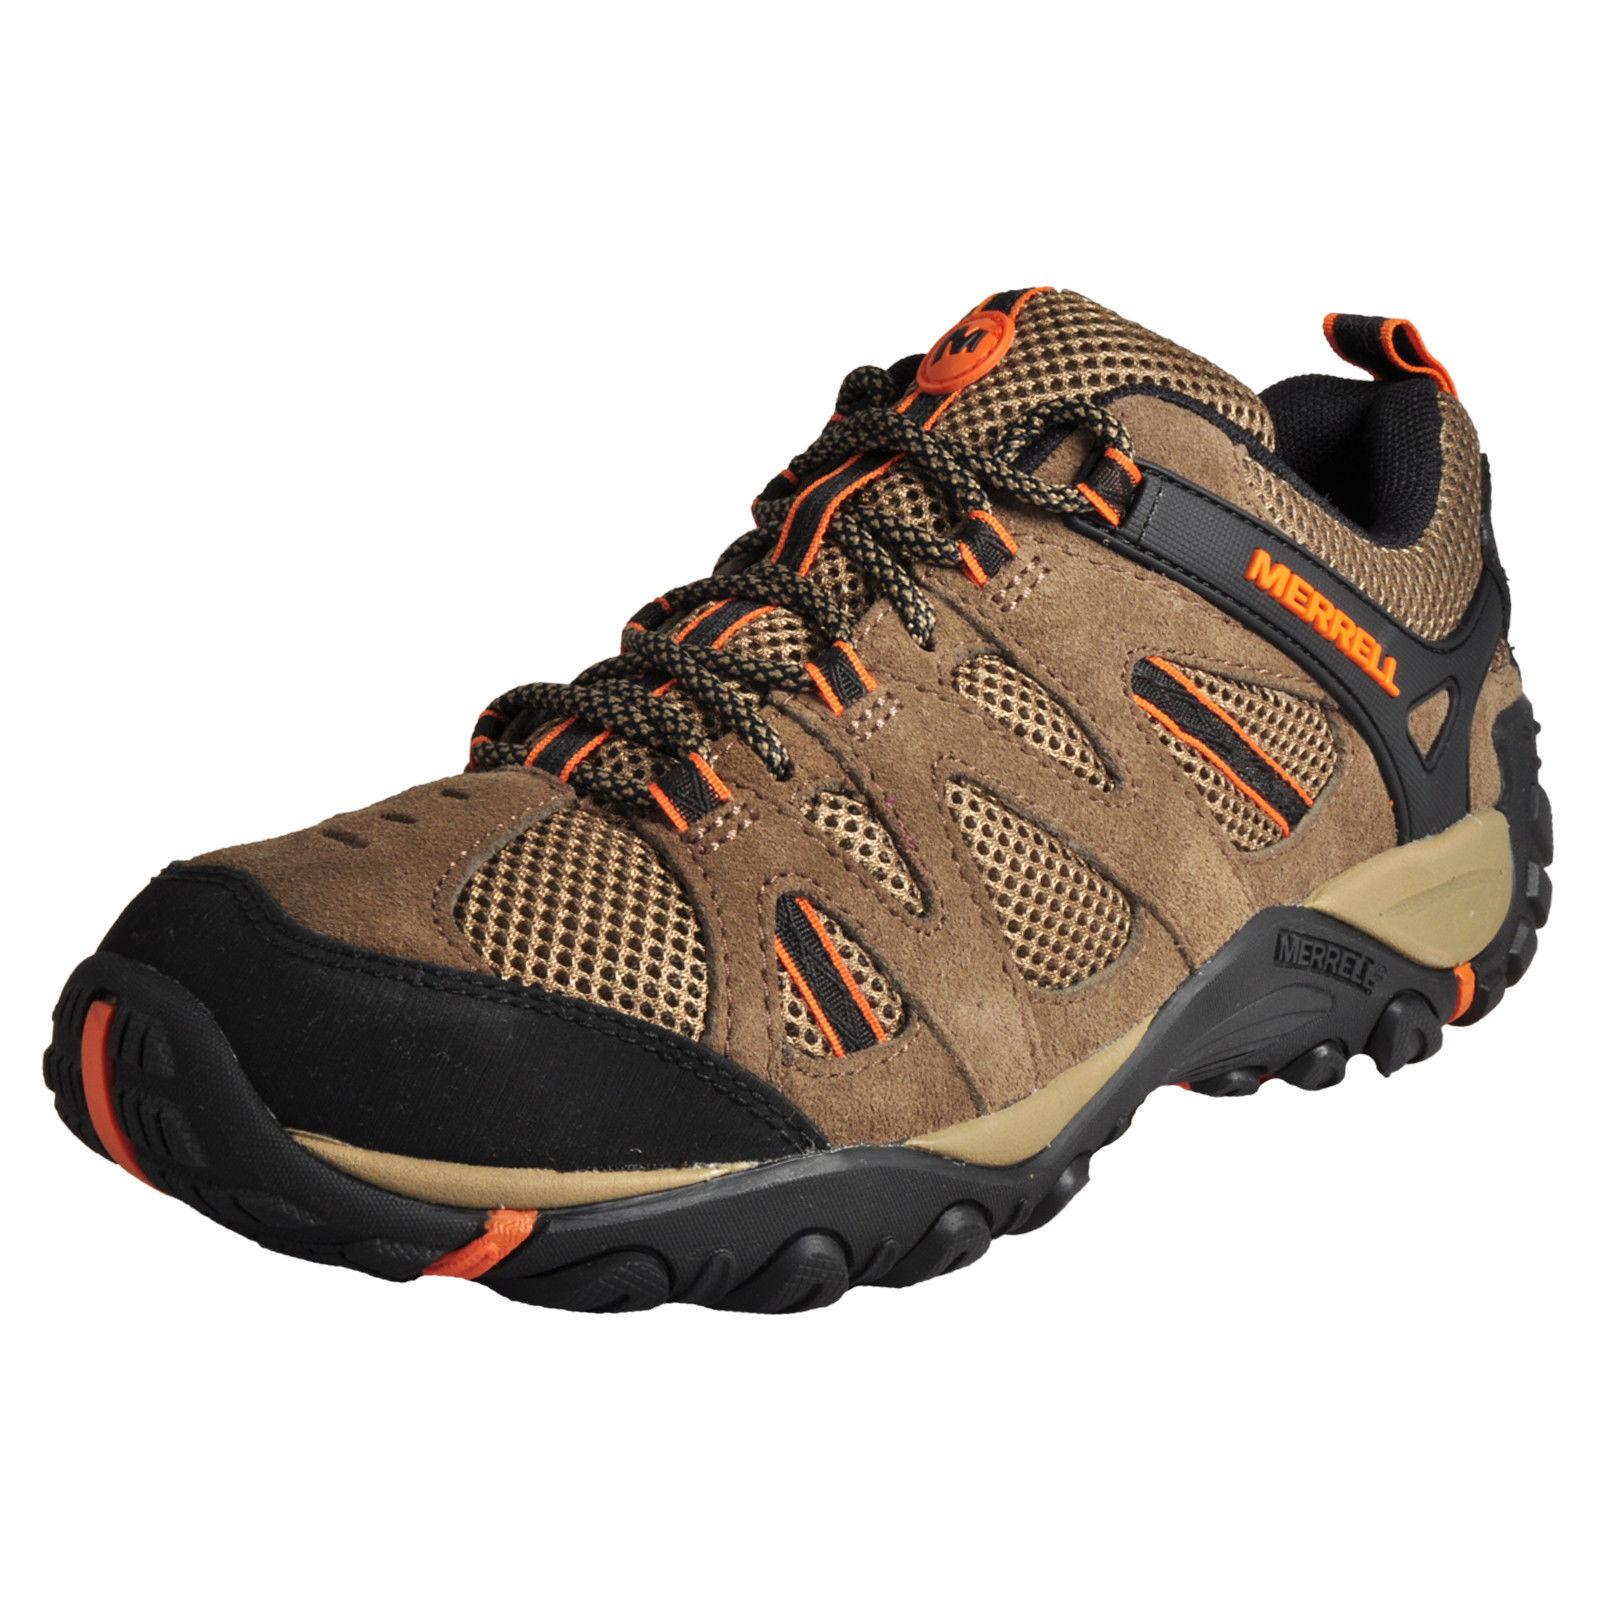 Merrell 'Yokota Ascender' Vent Men's Canteen Borange Walking Hiking Trail shoes